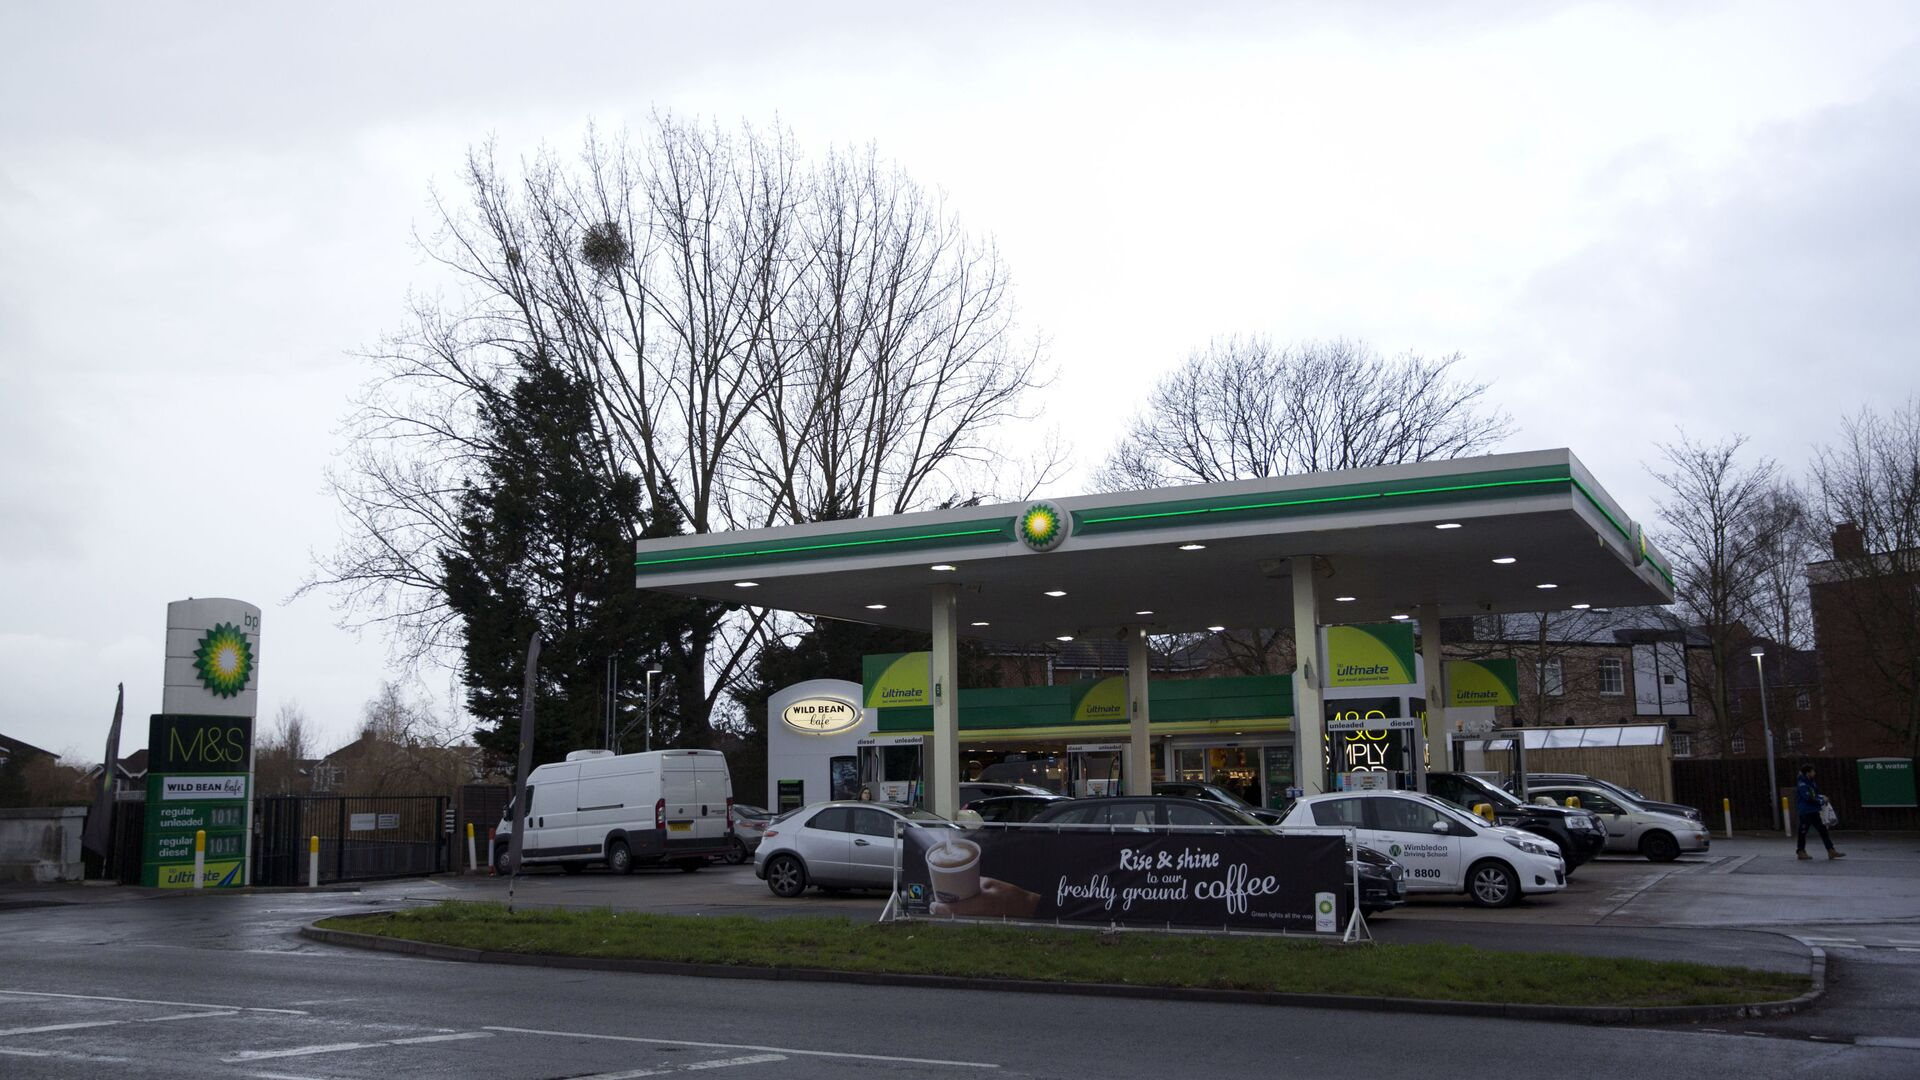 A BP petrol station is seen in East Molesey, south west London, Tuesday, Feb. 2, 2016 - Sputnik International, 1920, 26.09.2021